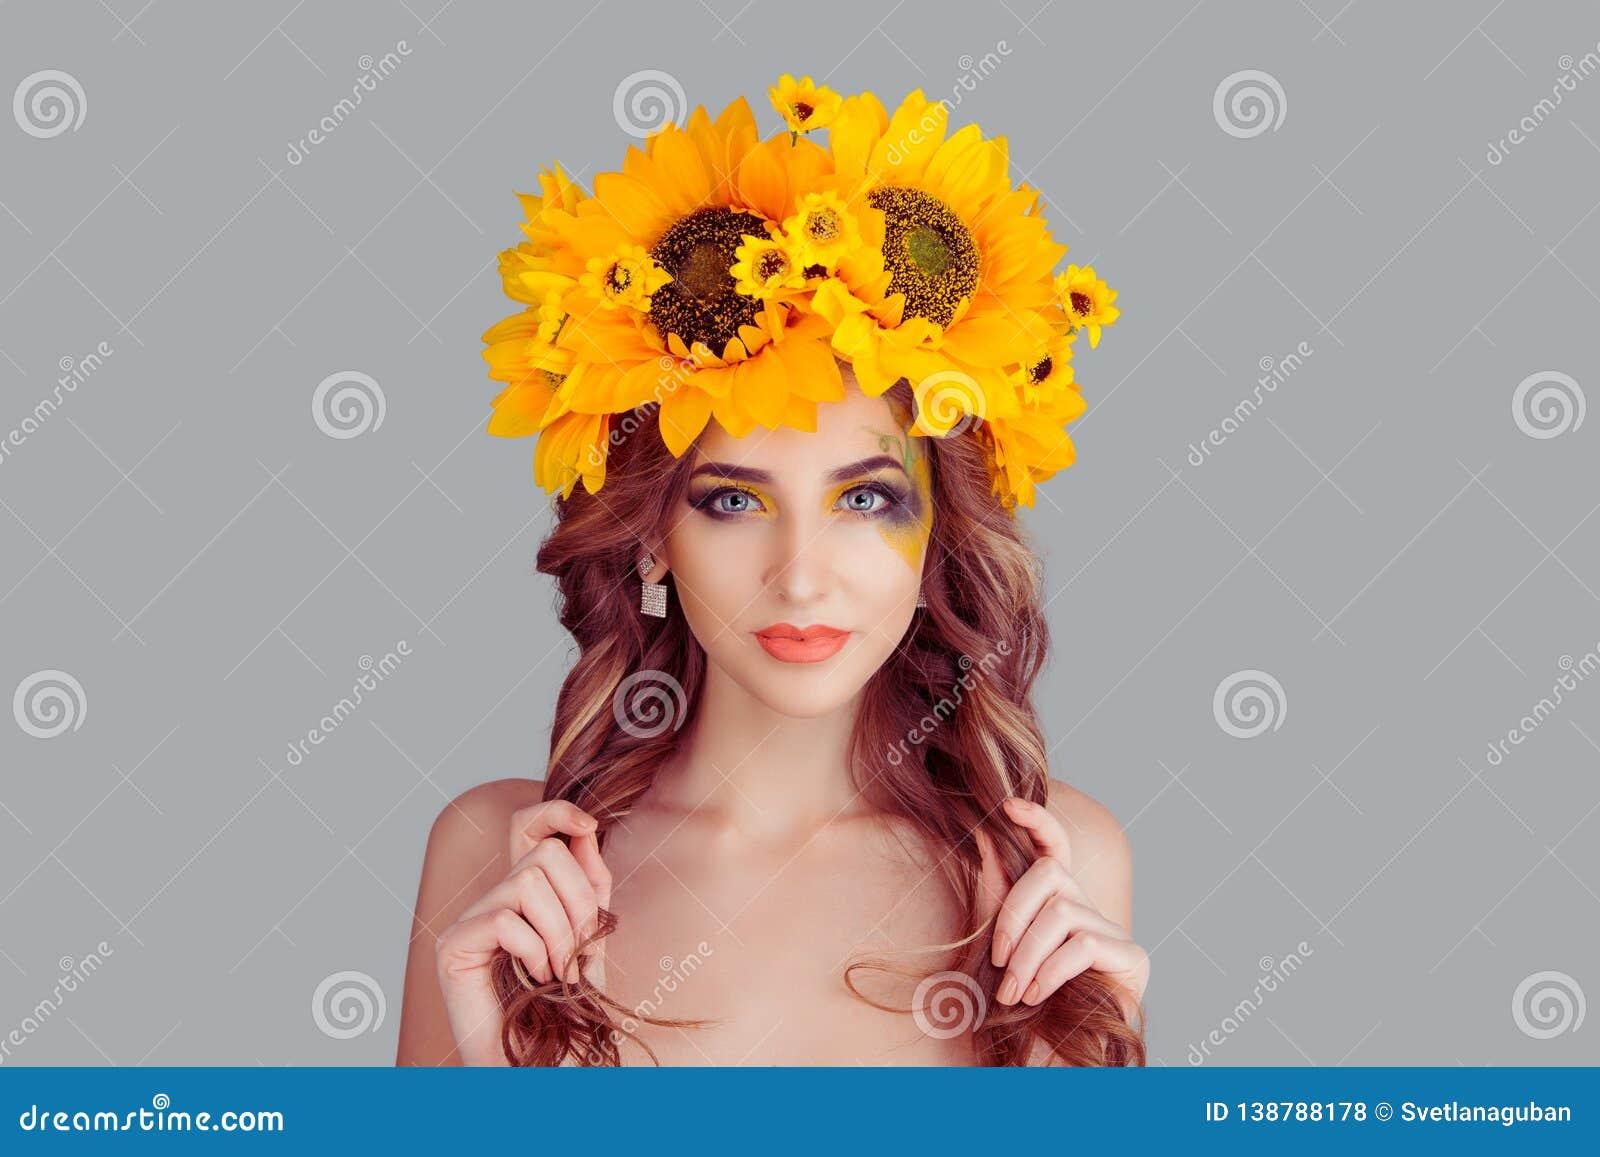 Beautiful young woman wearing floral headband